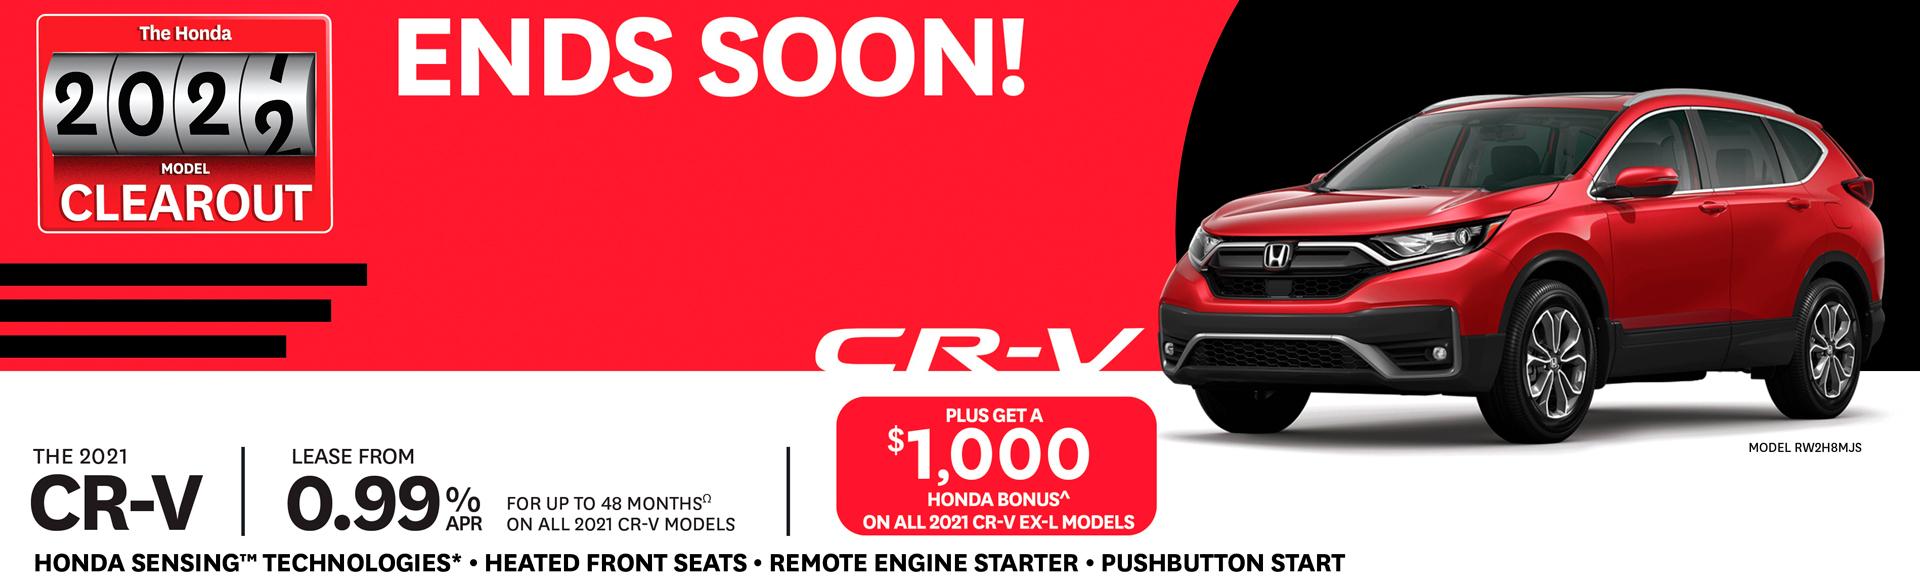 2021 CR-V